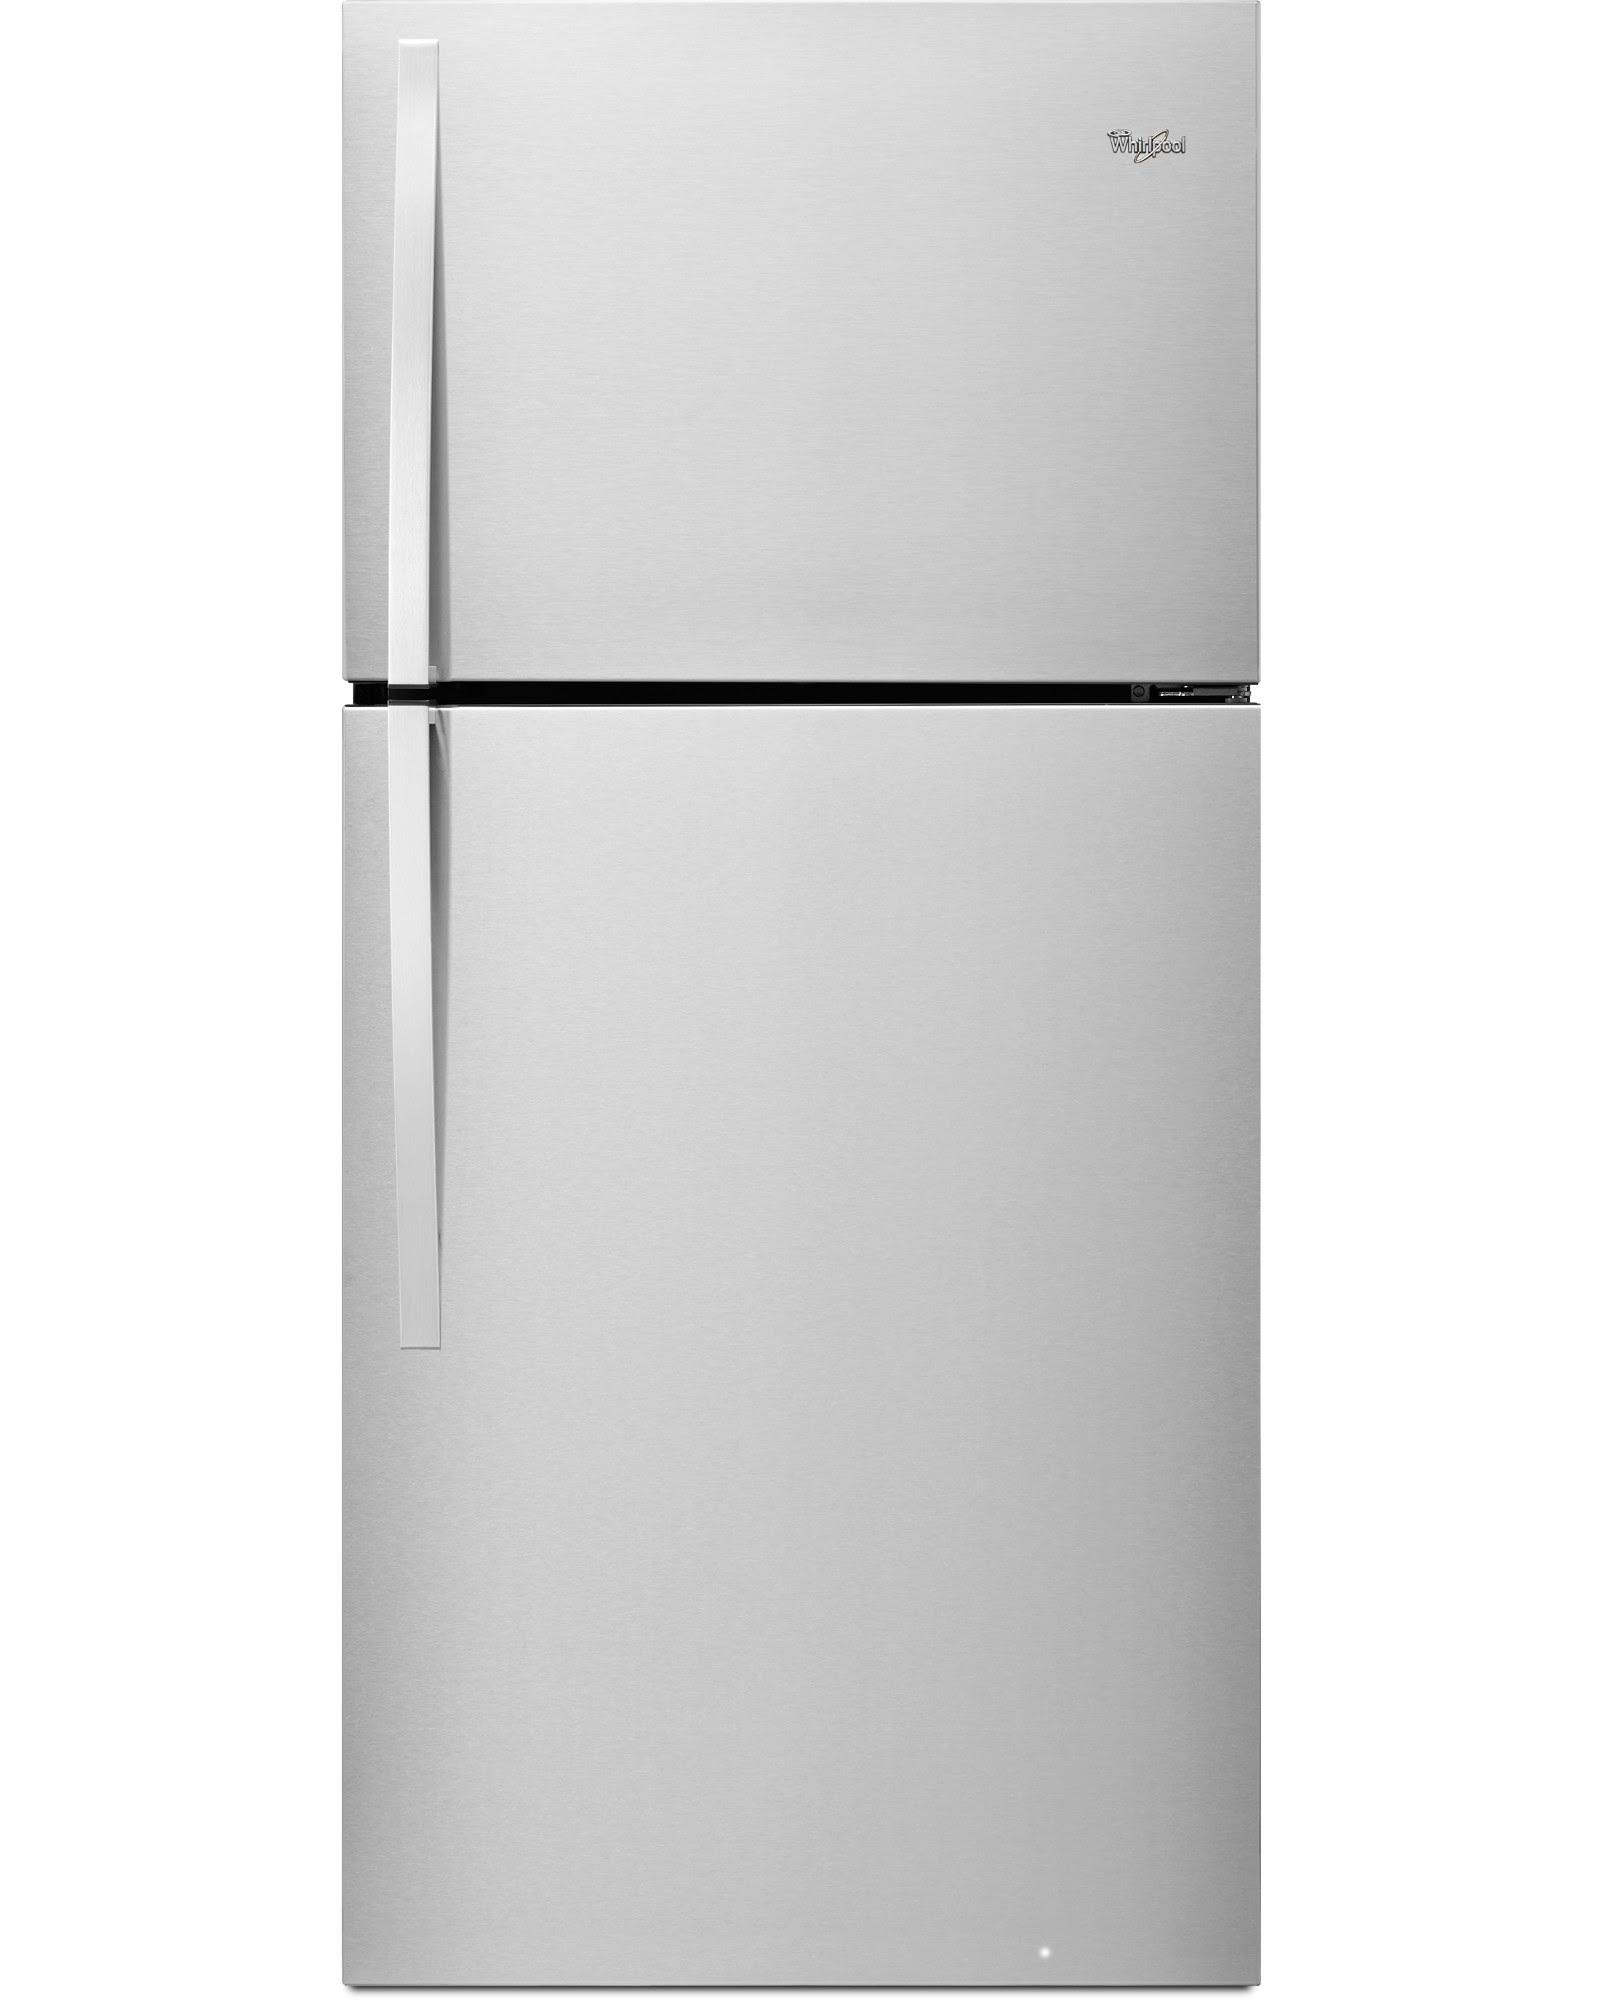 UPC Whirlpool WRT519SZDM 19 2 cu ft Top Freezer